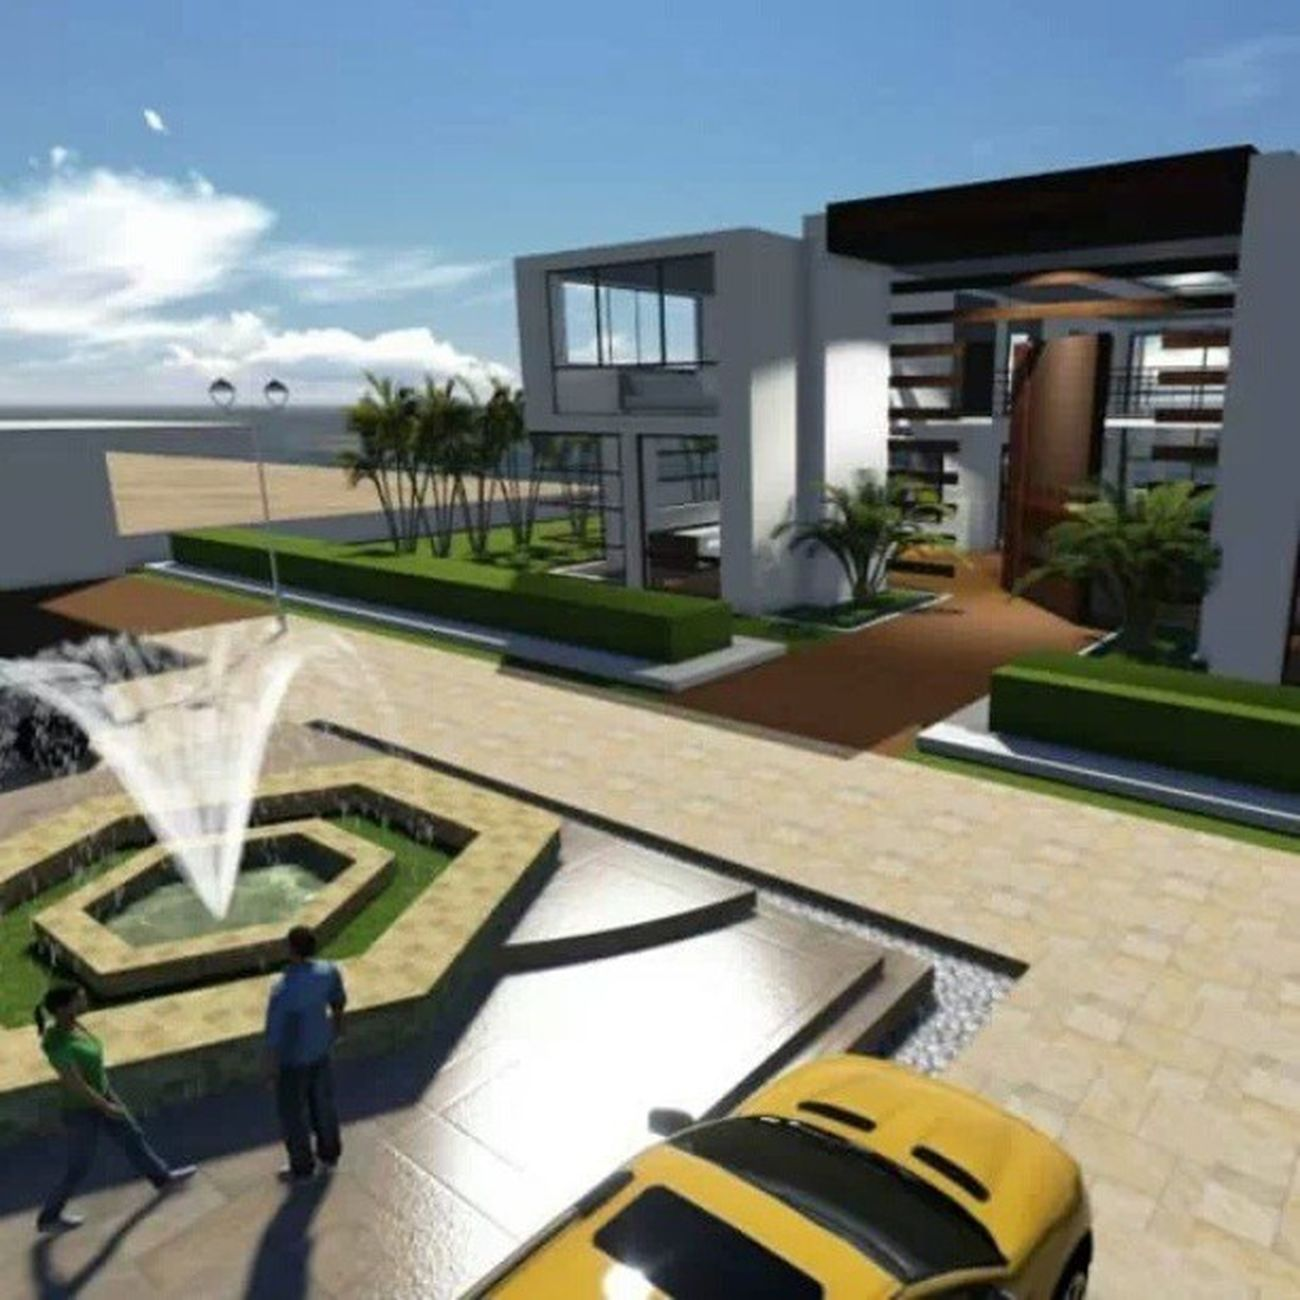 Minha Humilde Residencia....aqui n falta energia kkkkkkkkkkk Arquitetura Architecture 3D MaqueteVirtual Work Sketchup Lumion3D BeachHouse BoaNoite